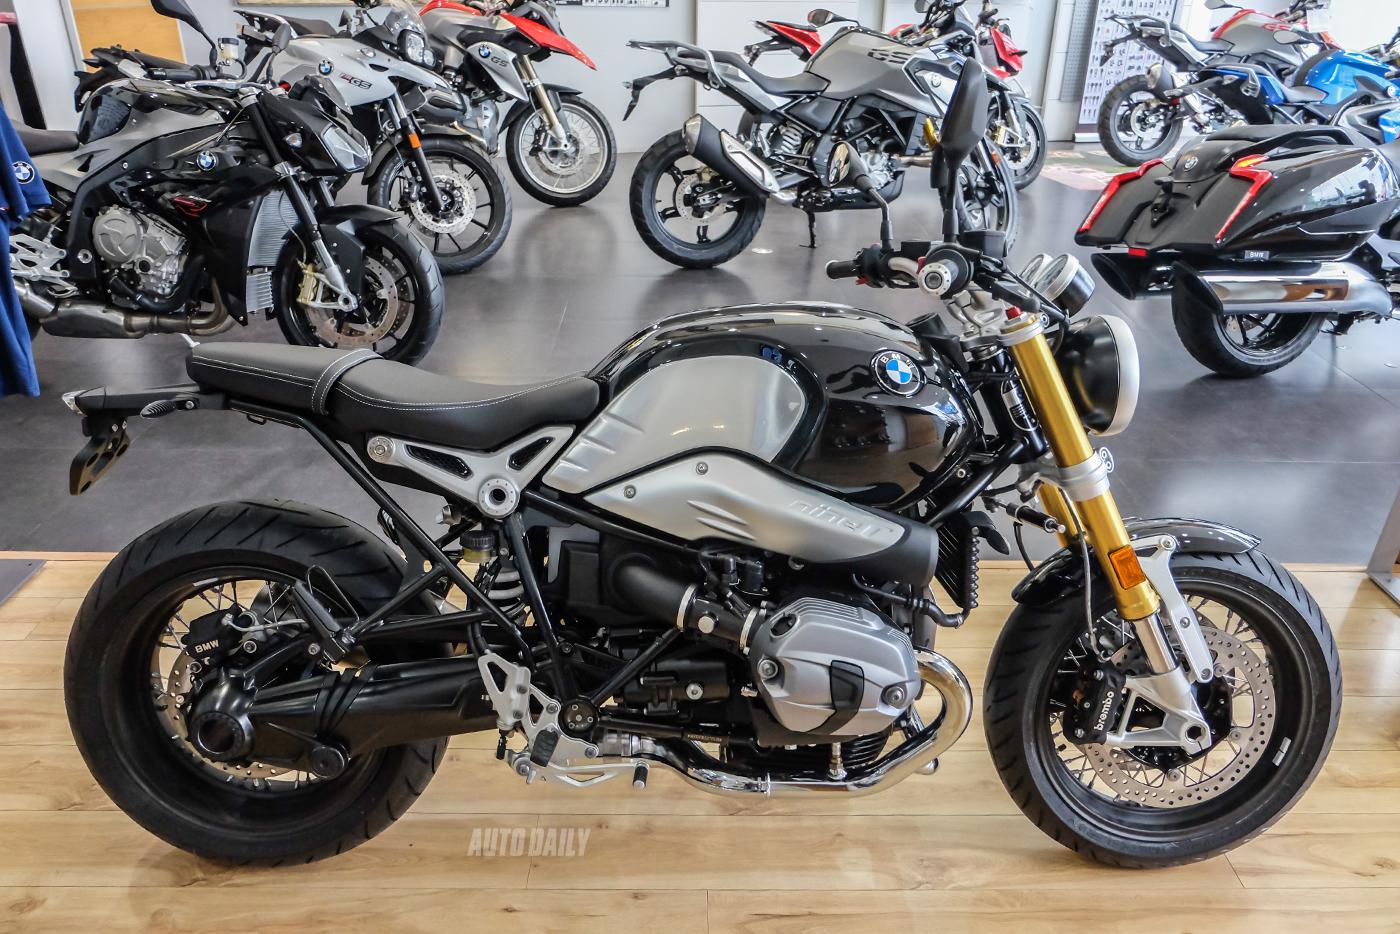 bmw-motorrad-r-nine-t-2018-9.jpg